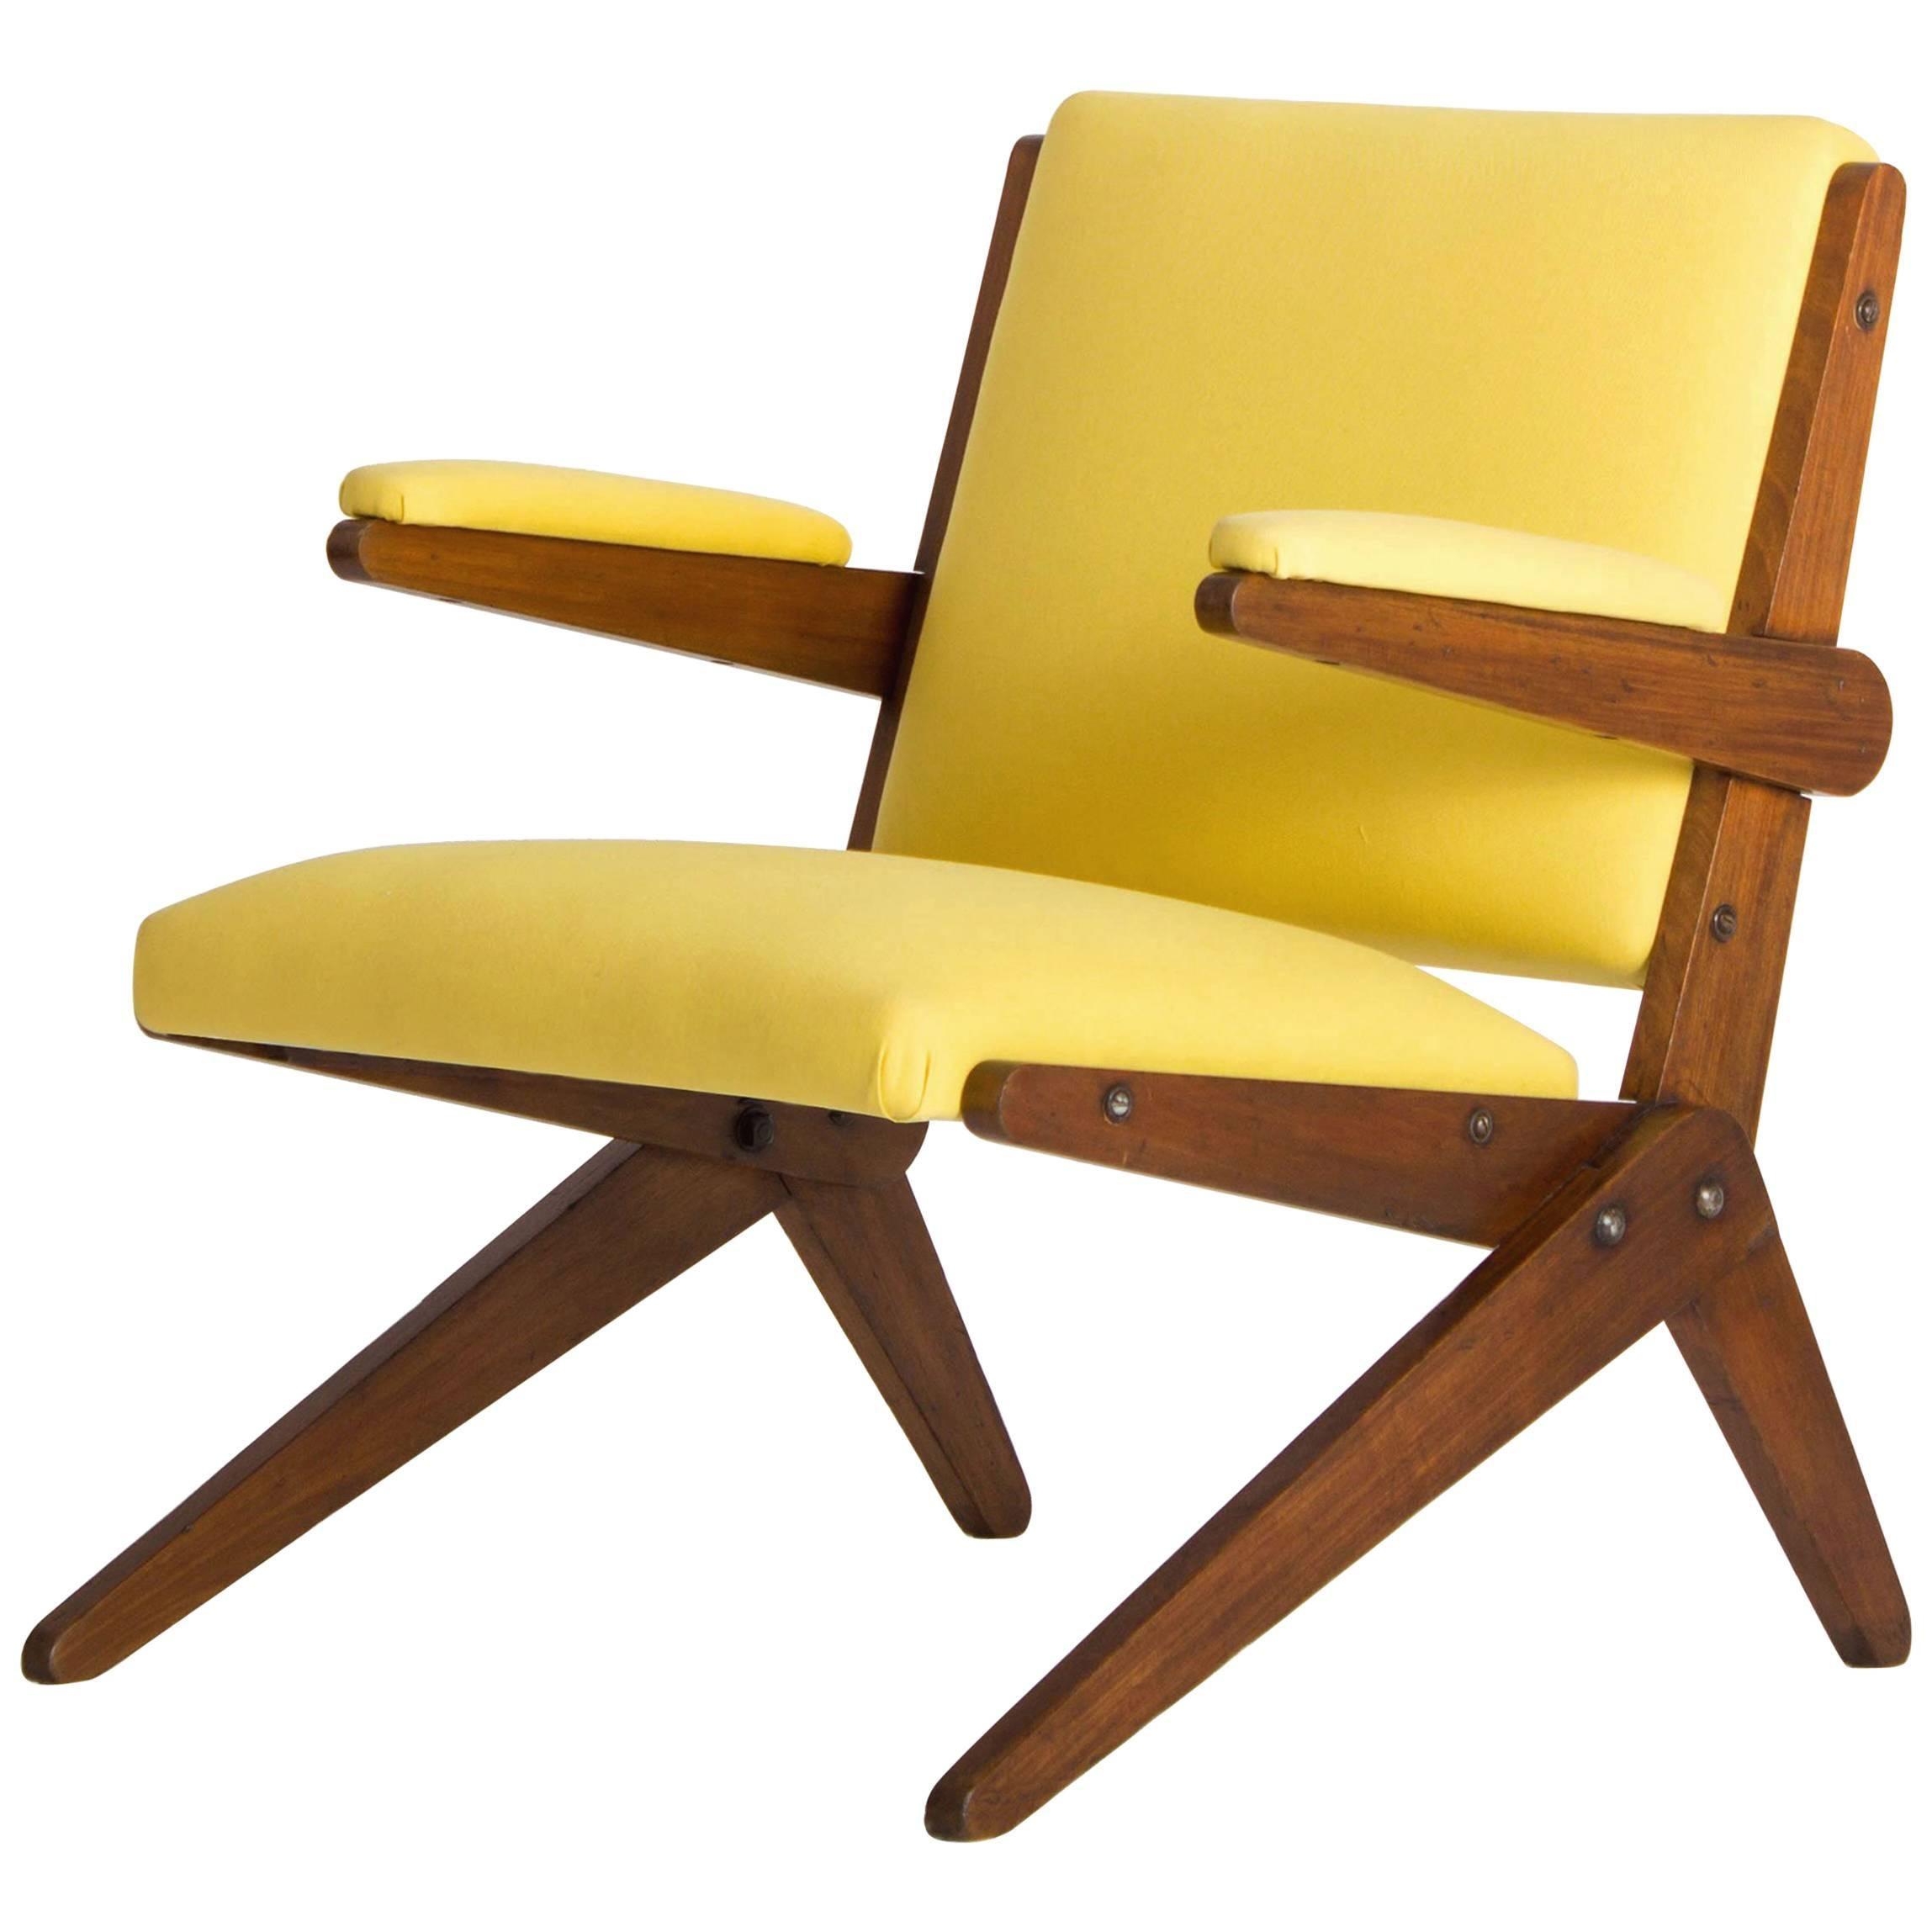 Yellow Lounge Chair By Lina Bo Bardi For Studio D´Arte Palma, Brazil,